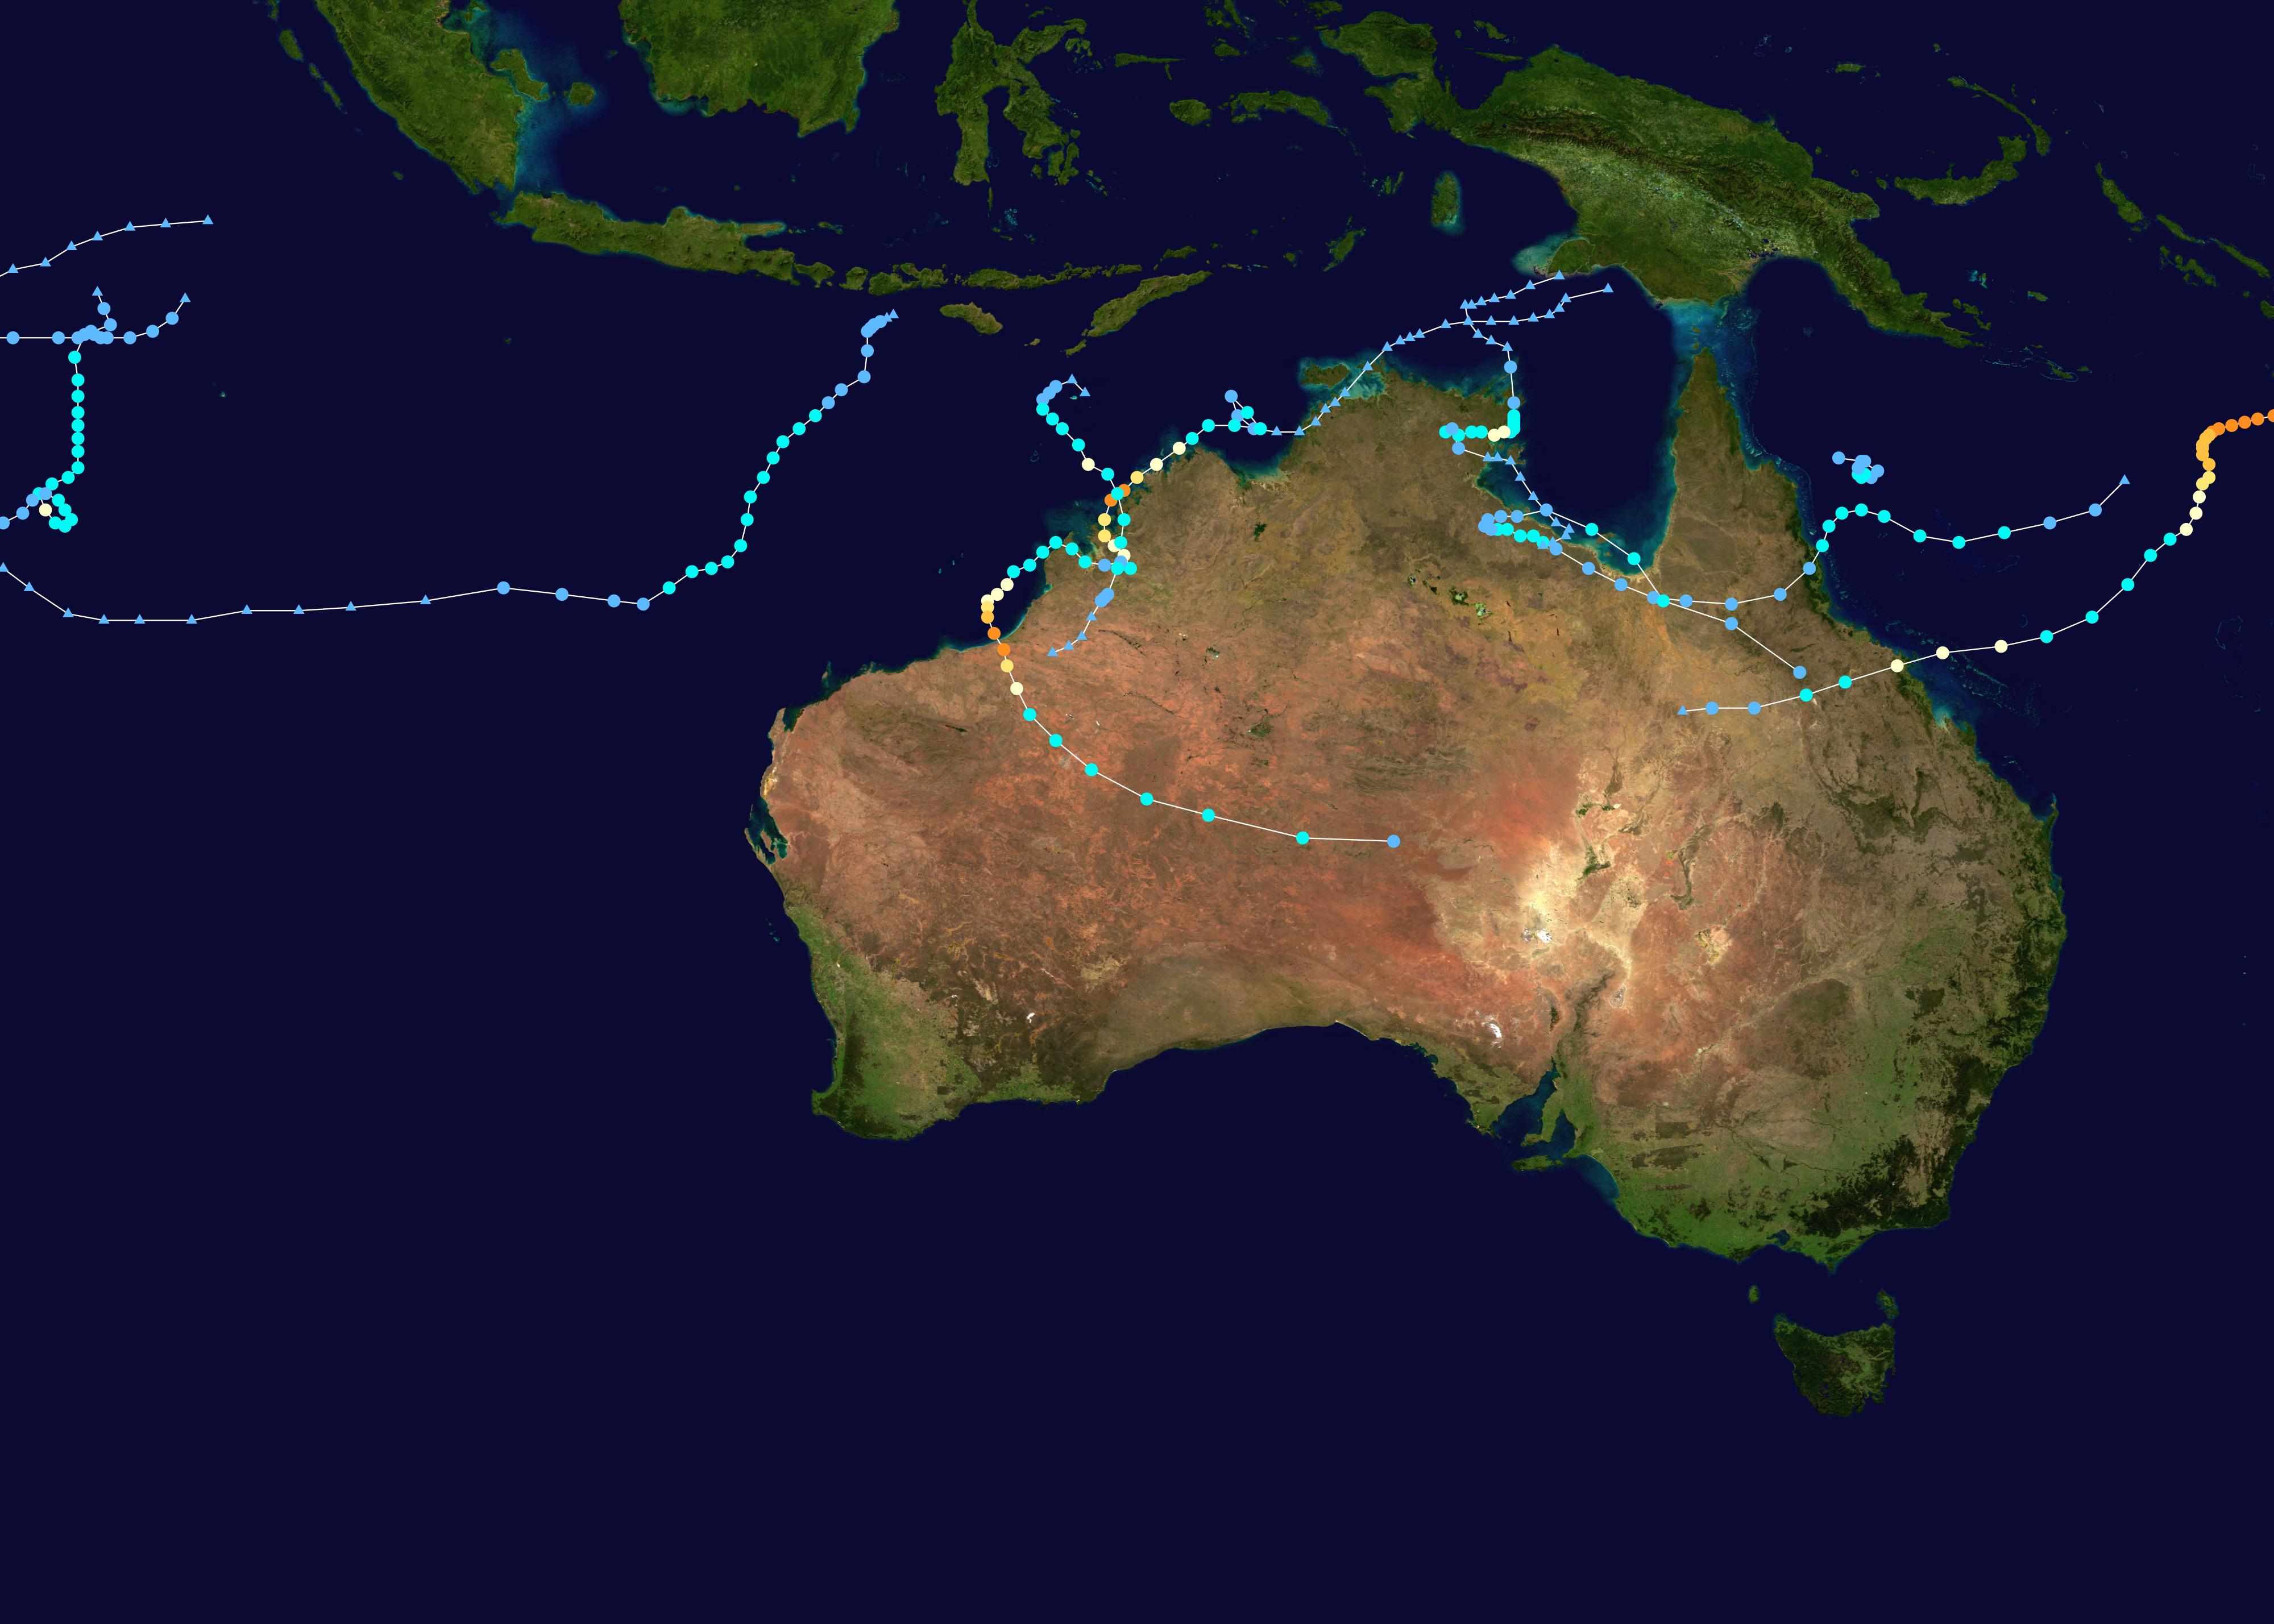 2009u201310 Australian region cyclone season